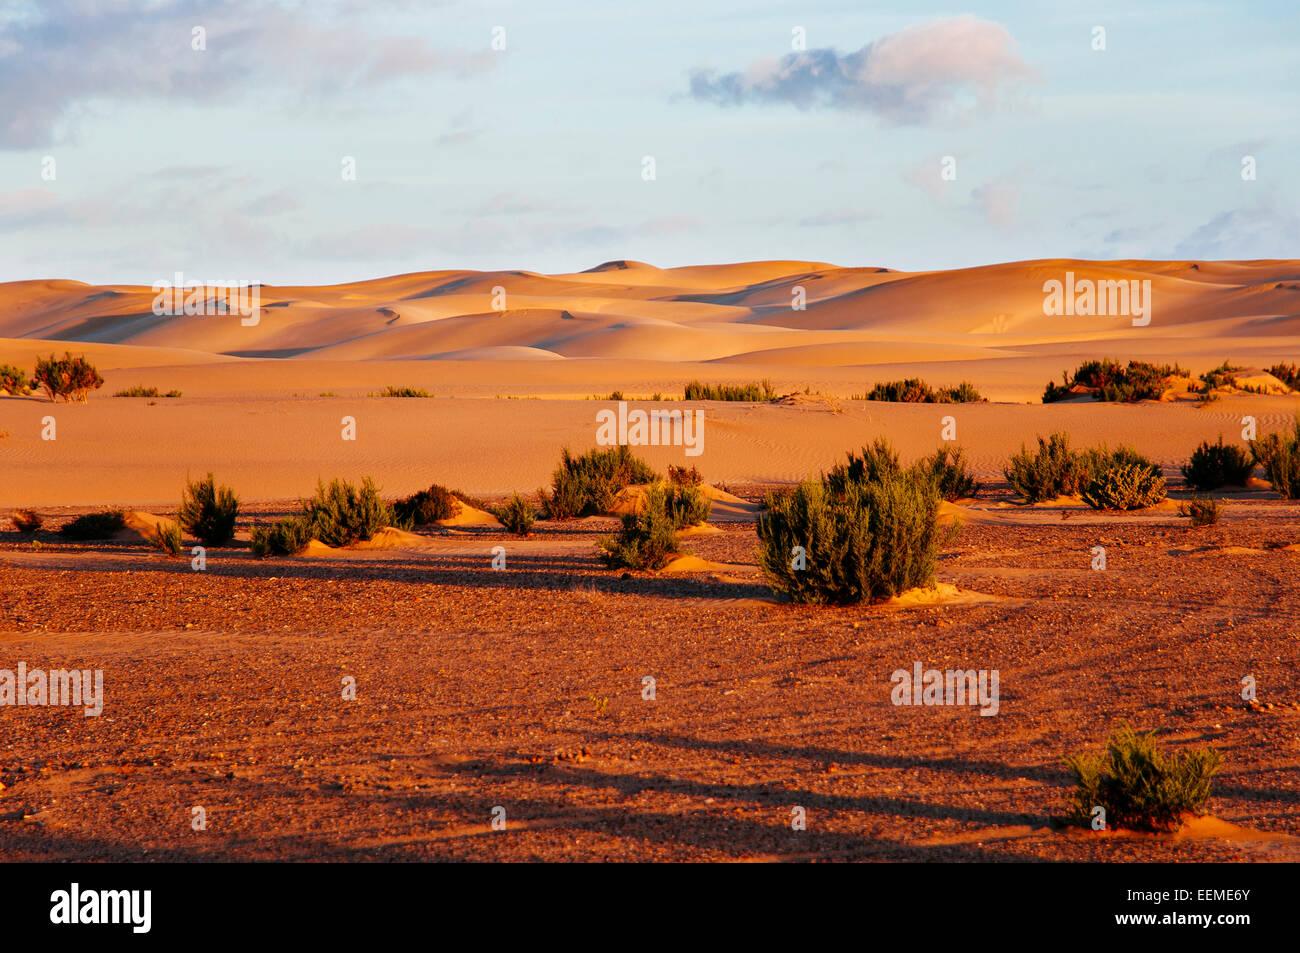 Sand dunes in Sahara desert, Western Sahara, Morocco. - Stock Image